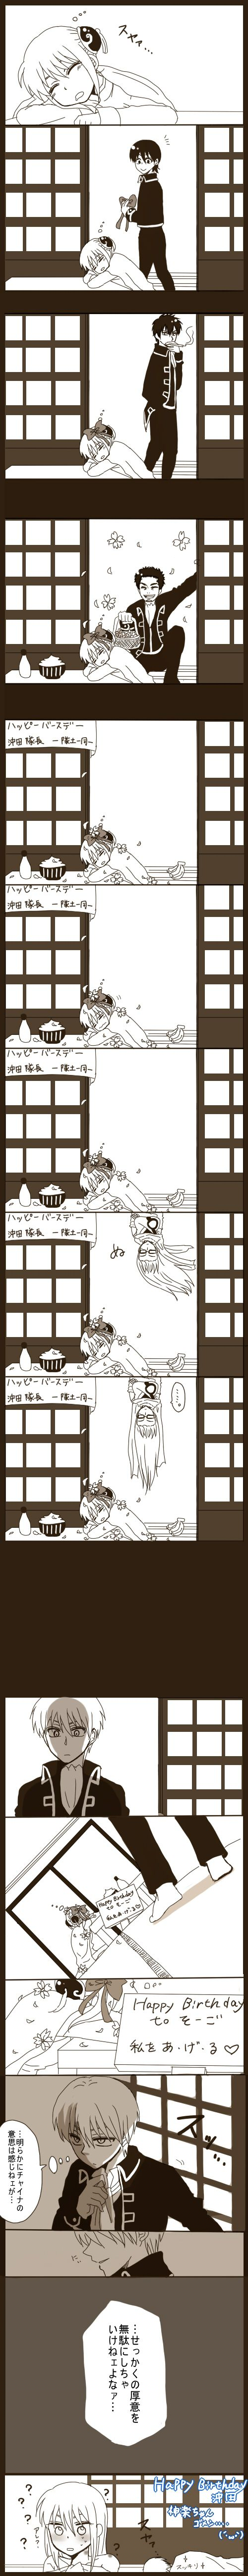 Pinterest I want a translation!!! Pls anyone give me a translation!!!  :D